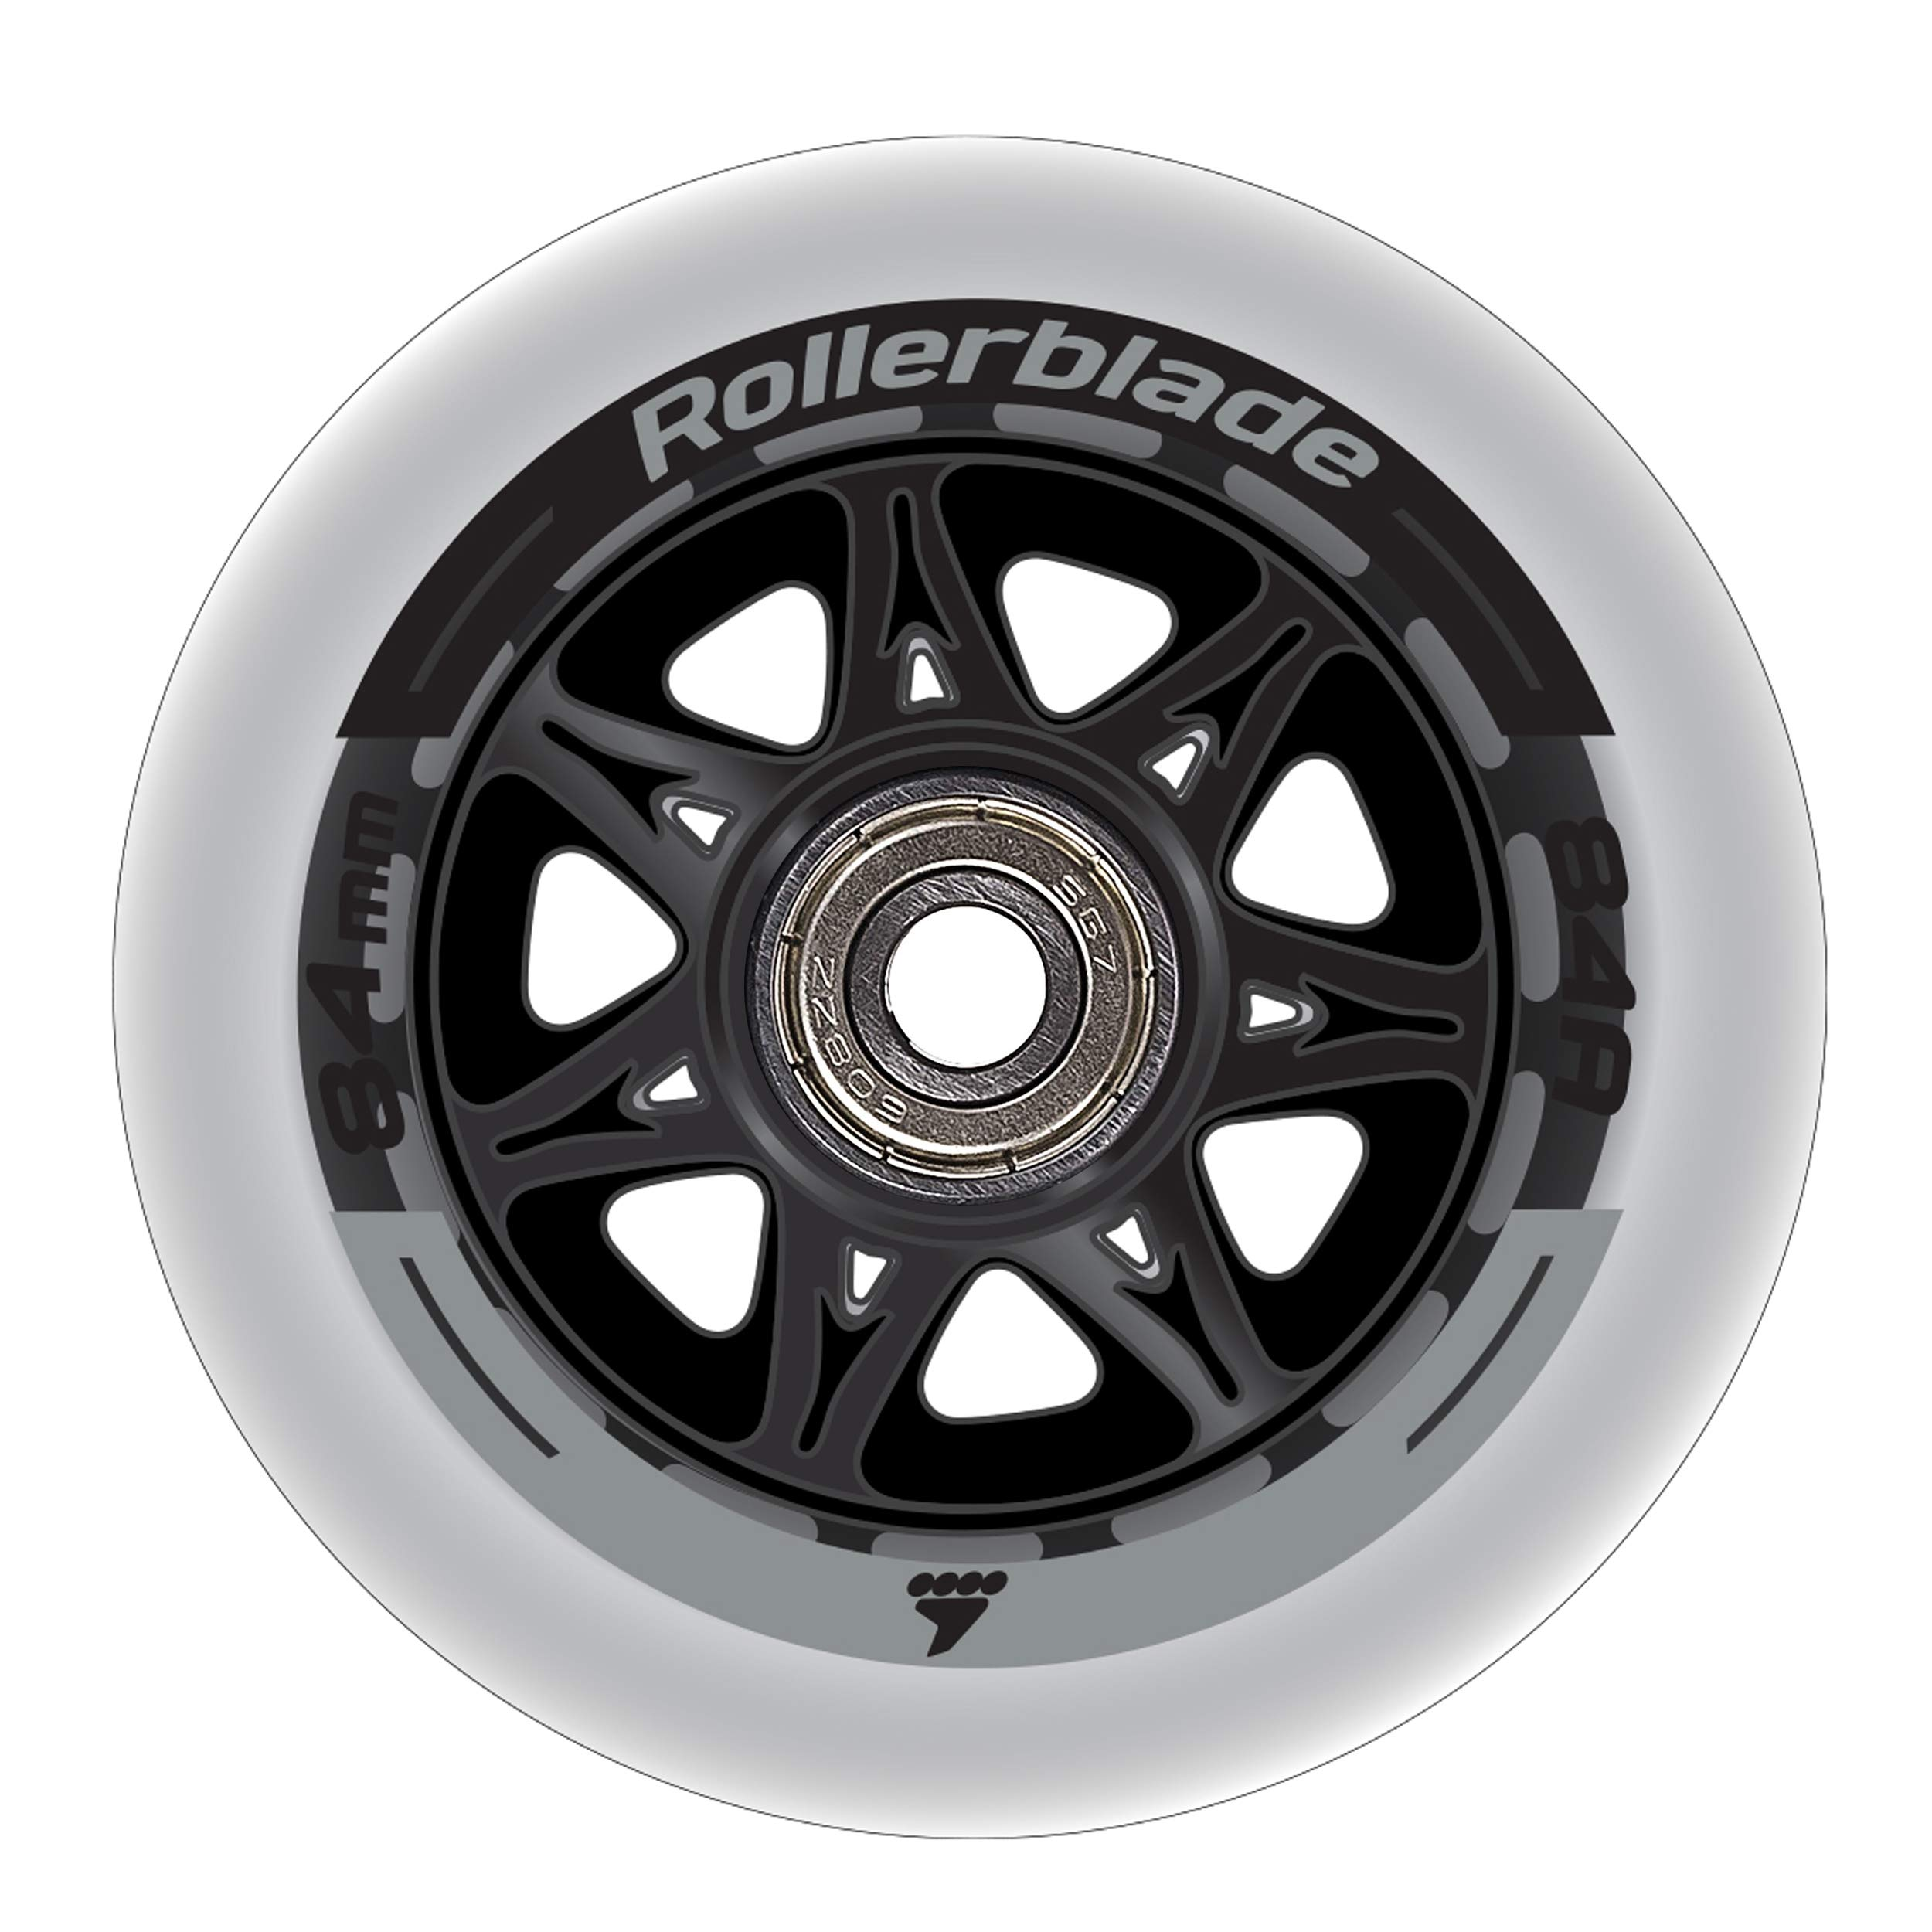 Rollerblade Wheelkit 84mm 84A, SG7 Bearings, 8 Pack, Clear, US Unisex ST by Rollerblade